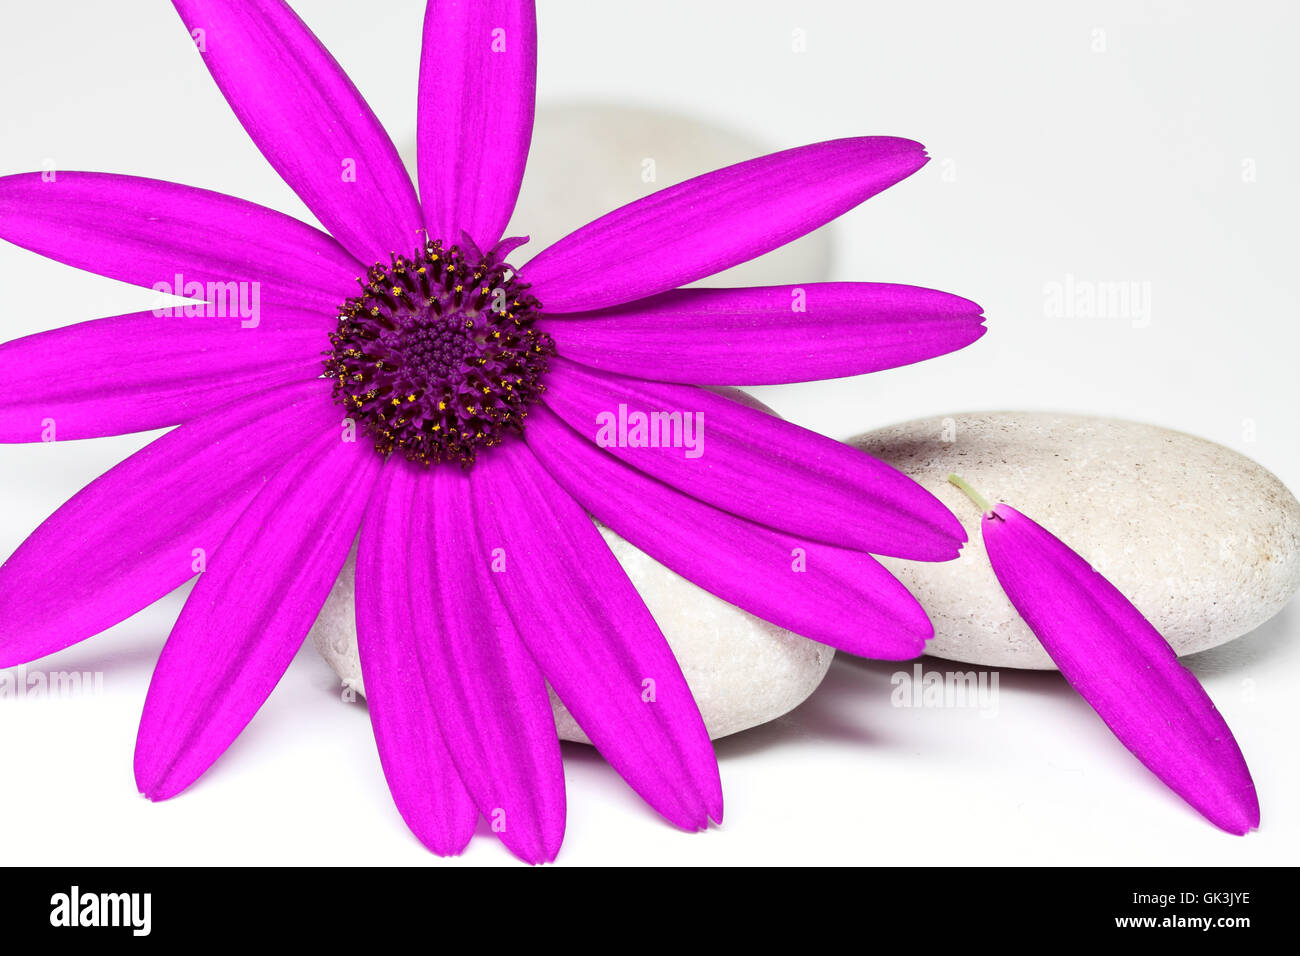 senetti pericallis closeup isolated - Stock Image